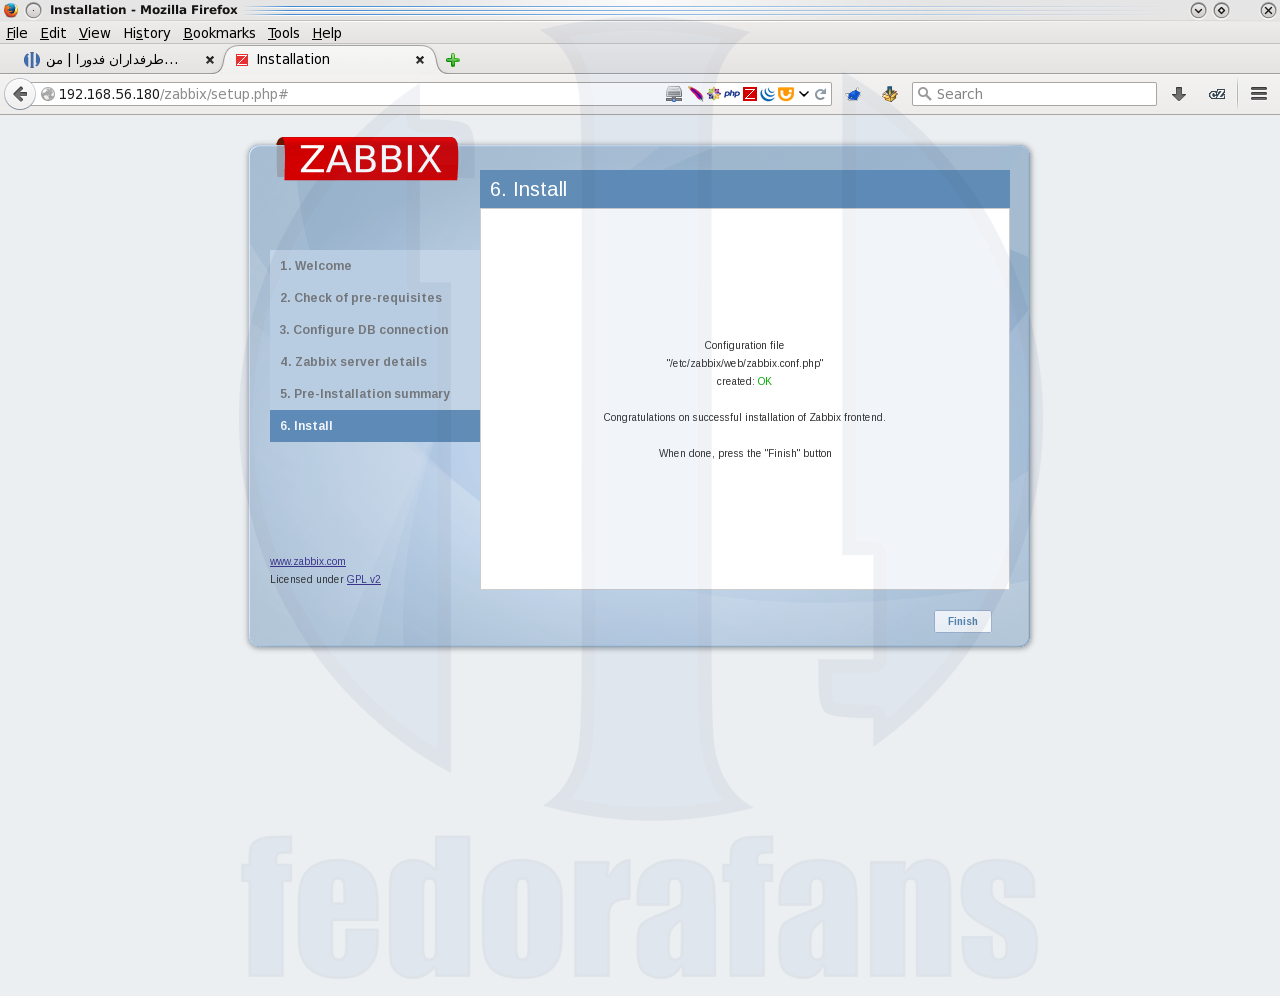 7-zabbix-fedorafans.com